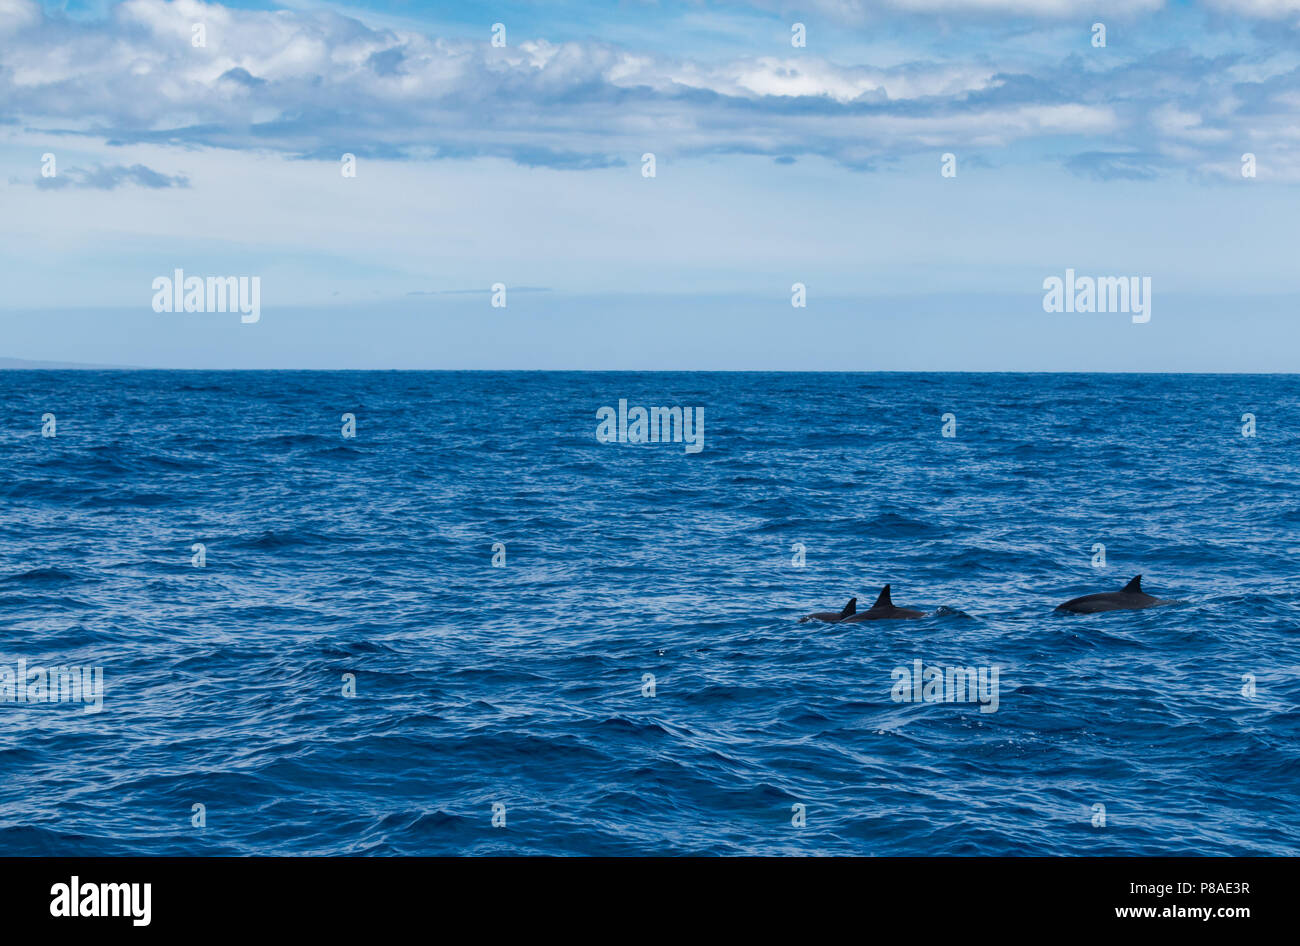 Wild Hawaiian Spinner dolphins, Stenella longirostris, swim freely off the coast of Lana'i. - Stock Image